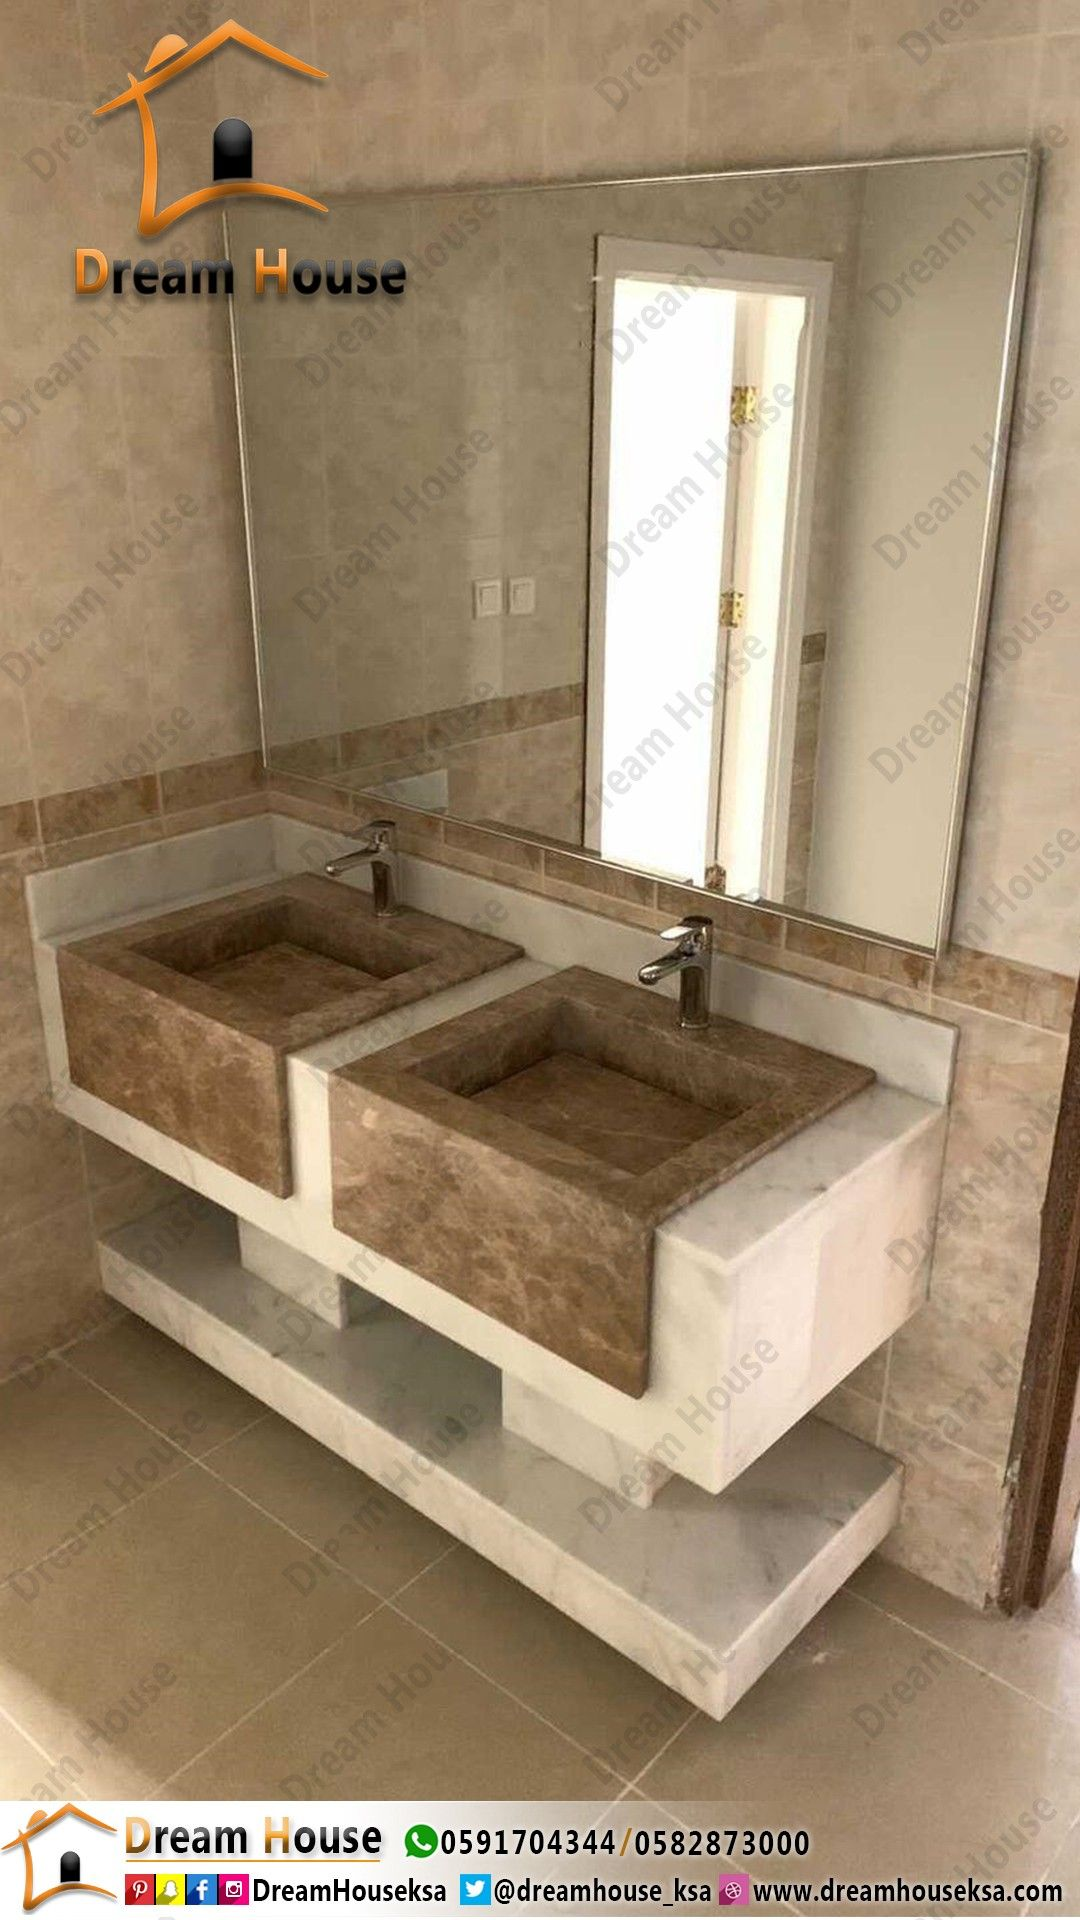 Pin By مغاسل منزل الاحلام On مغاسل رخام ملكي In 2021 Bathroom Vanity Home Decor Double Vanity